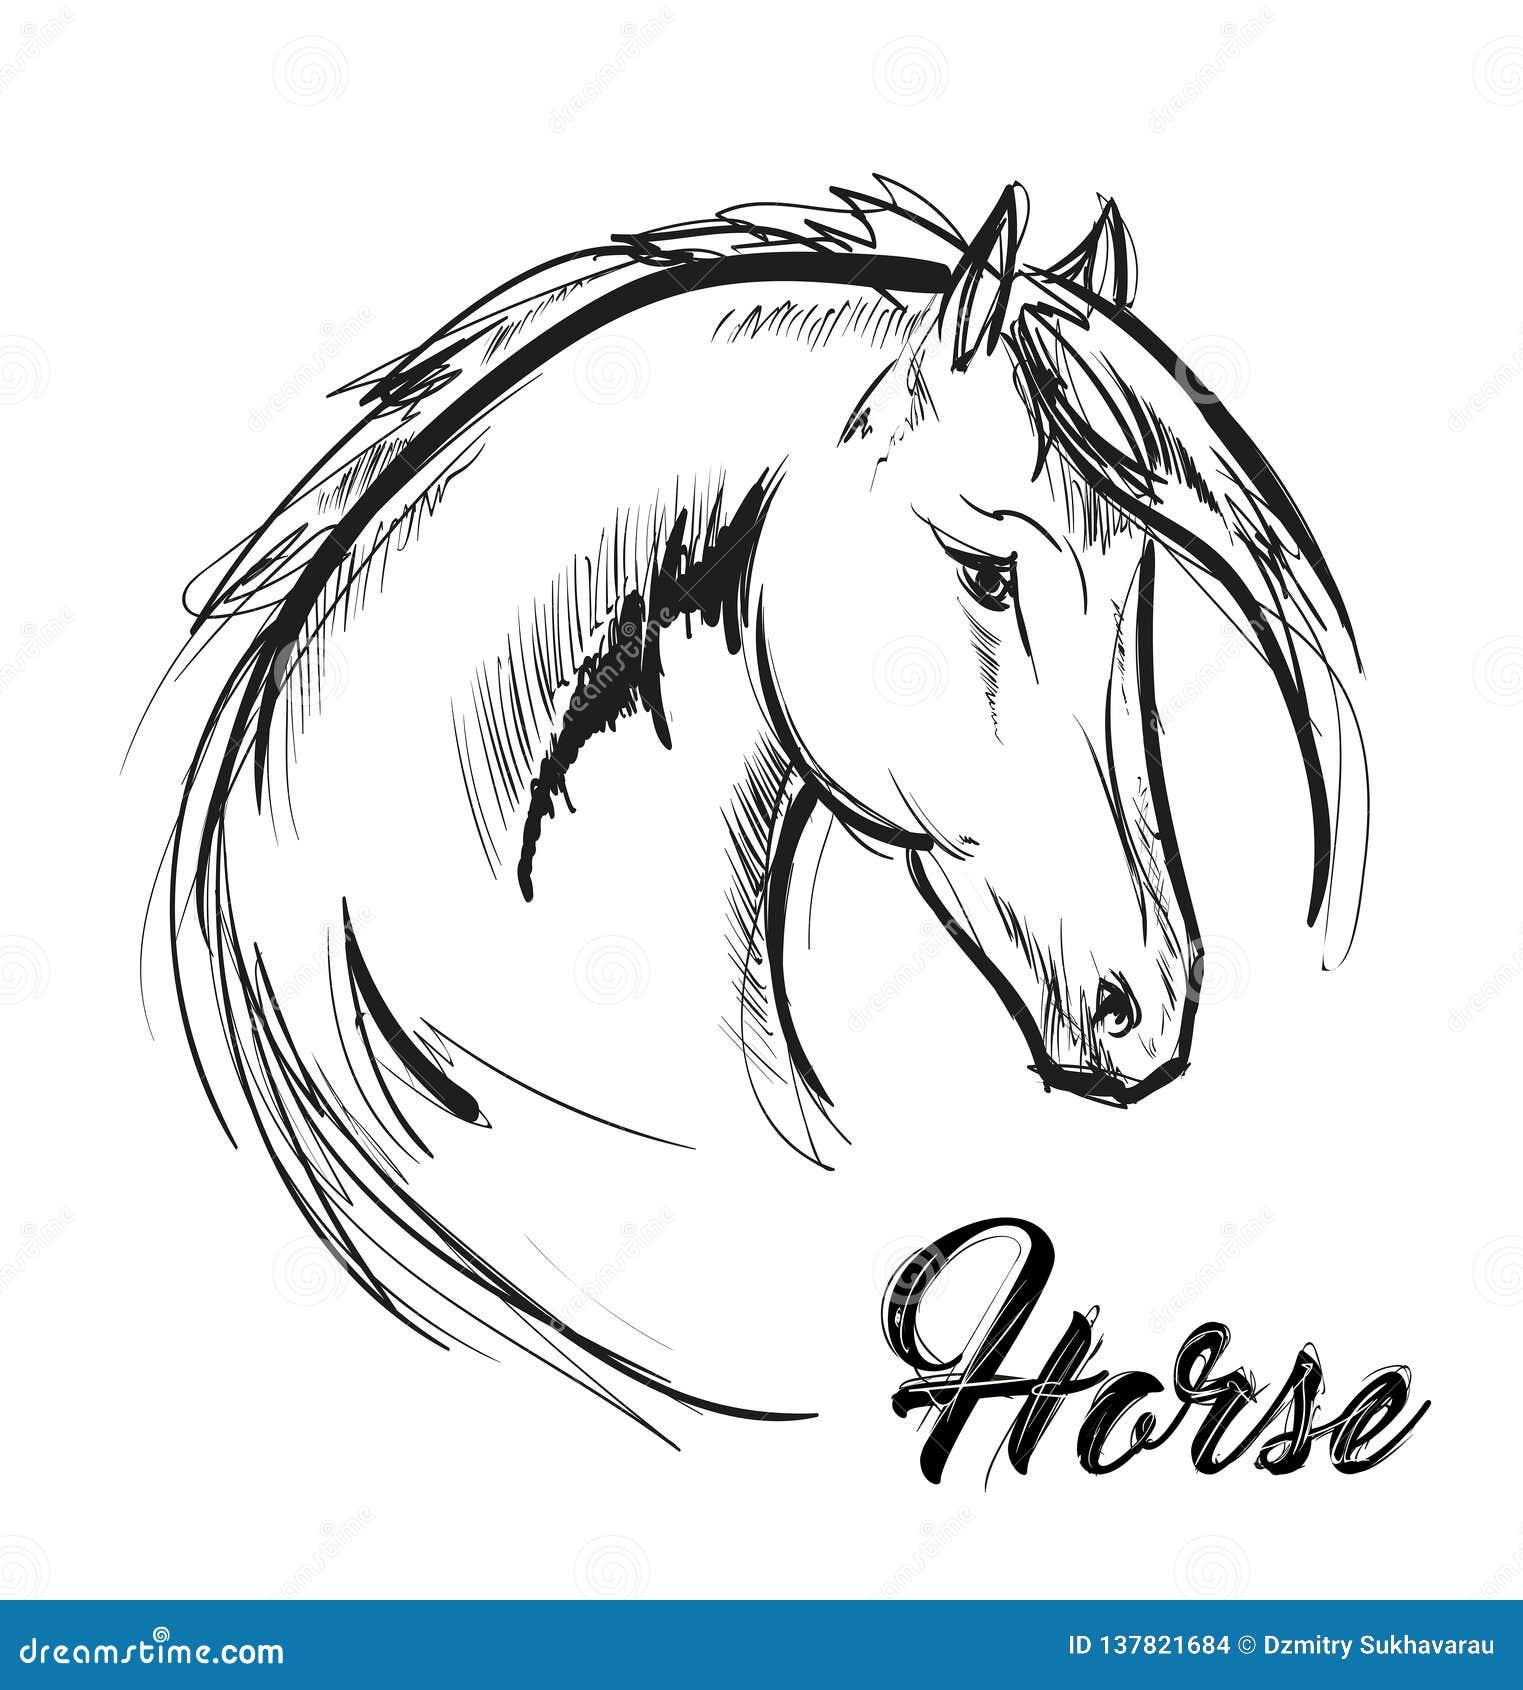 Pferdekopfprofil-Skizzenvektorgrafik Hand gezeichnete Abbildung